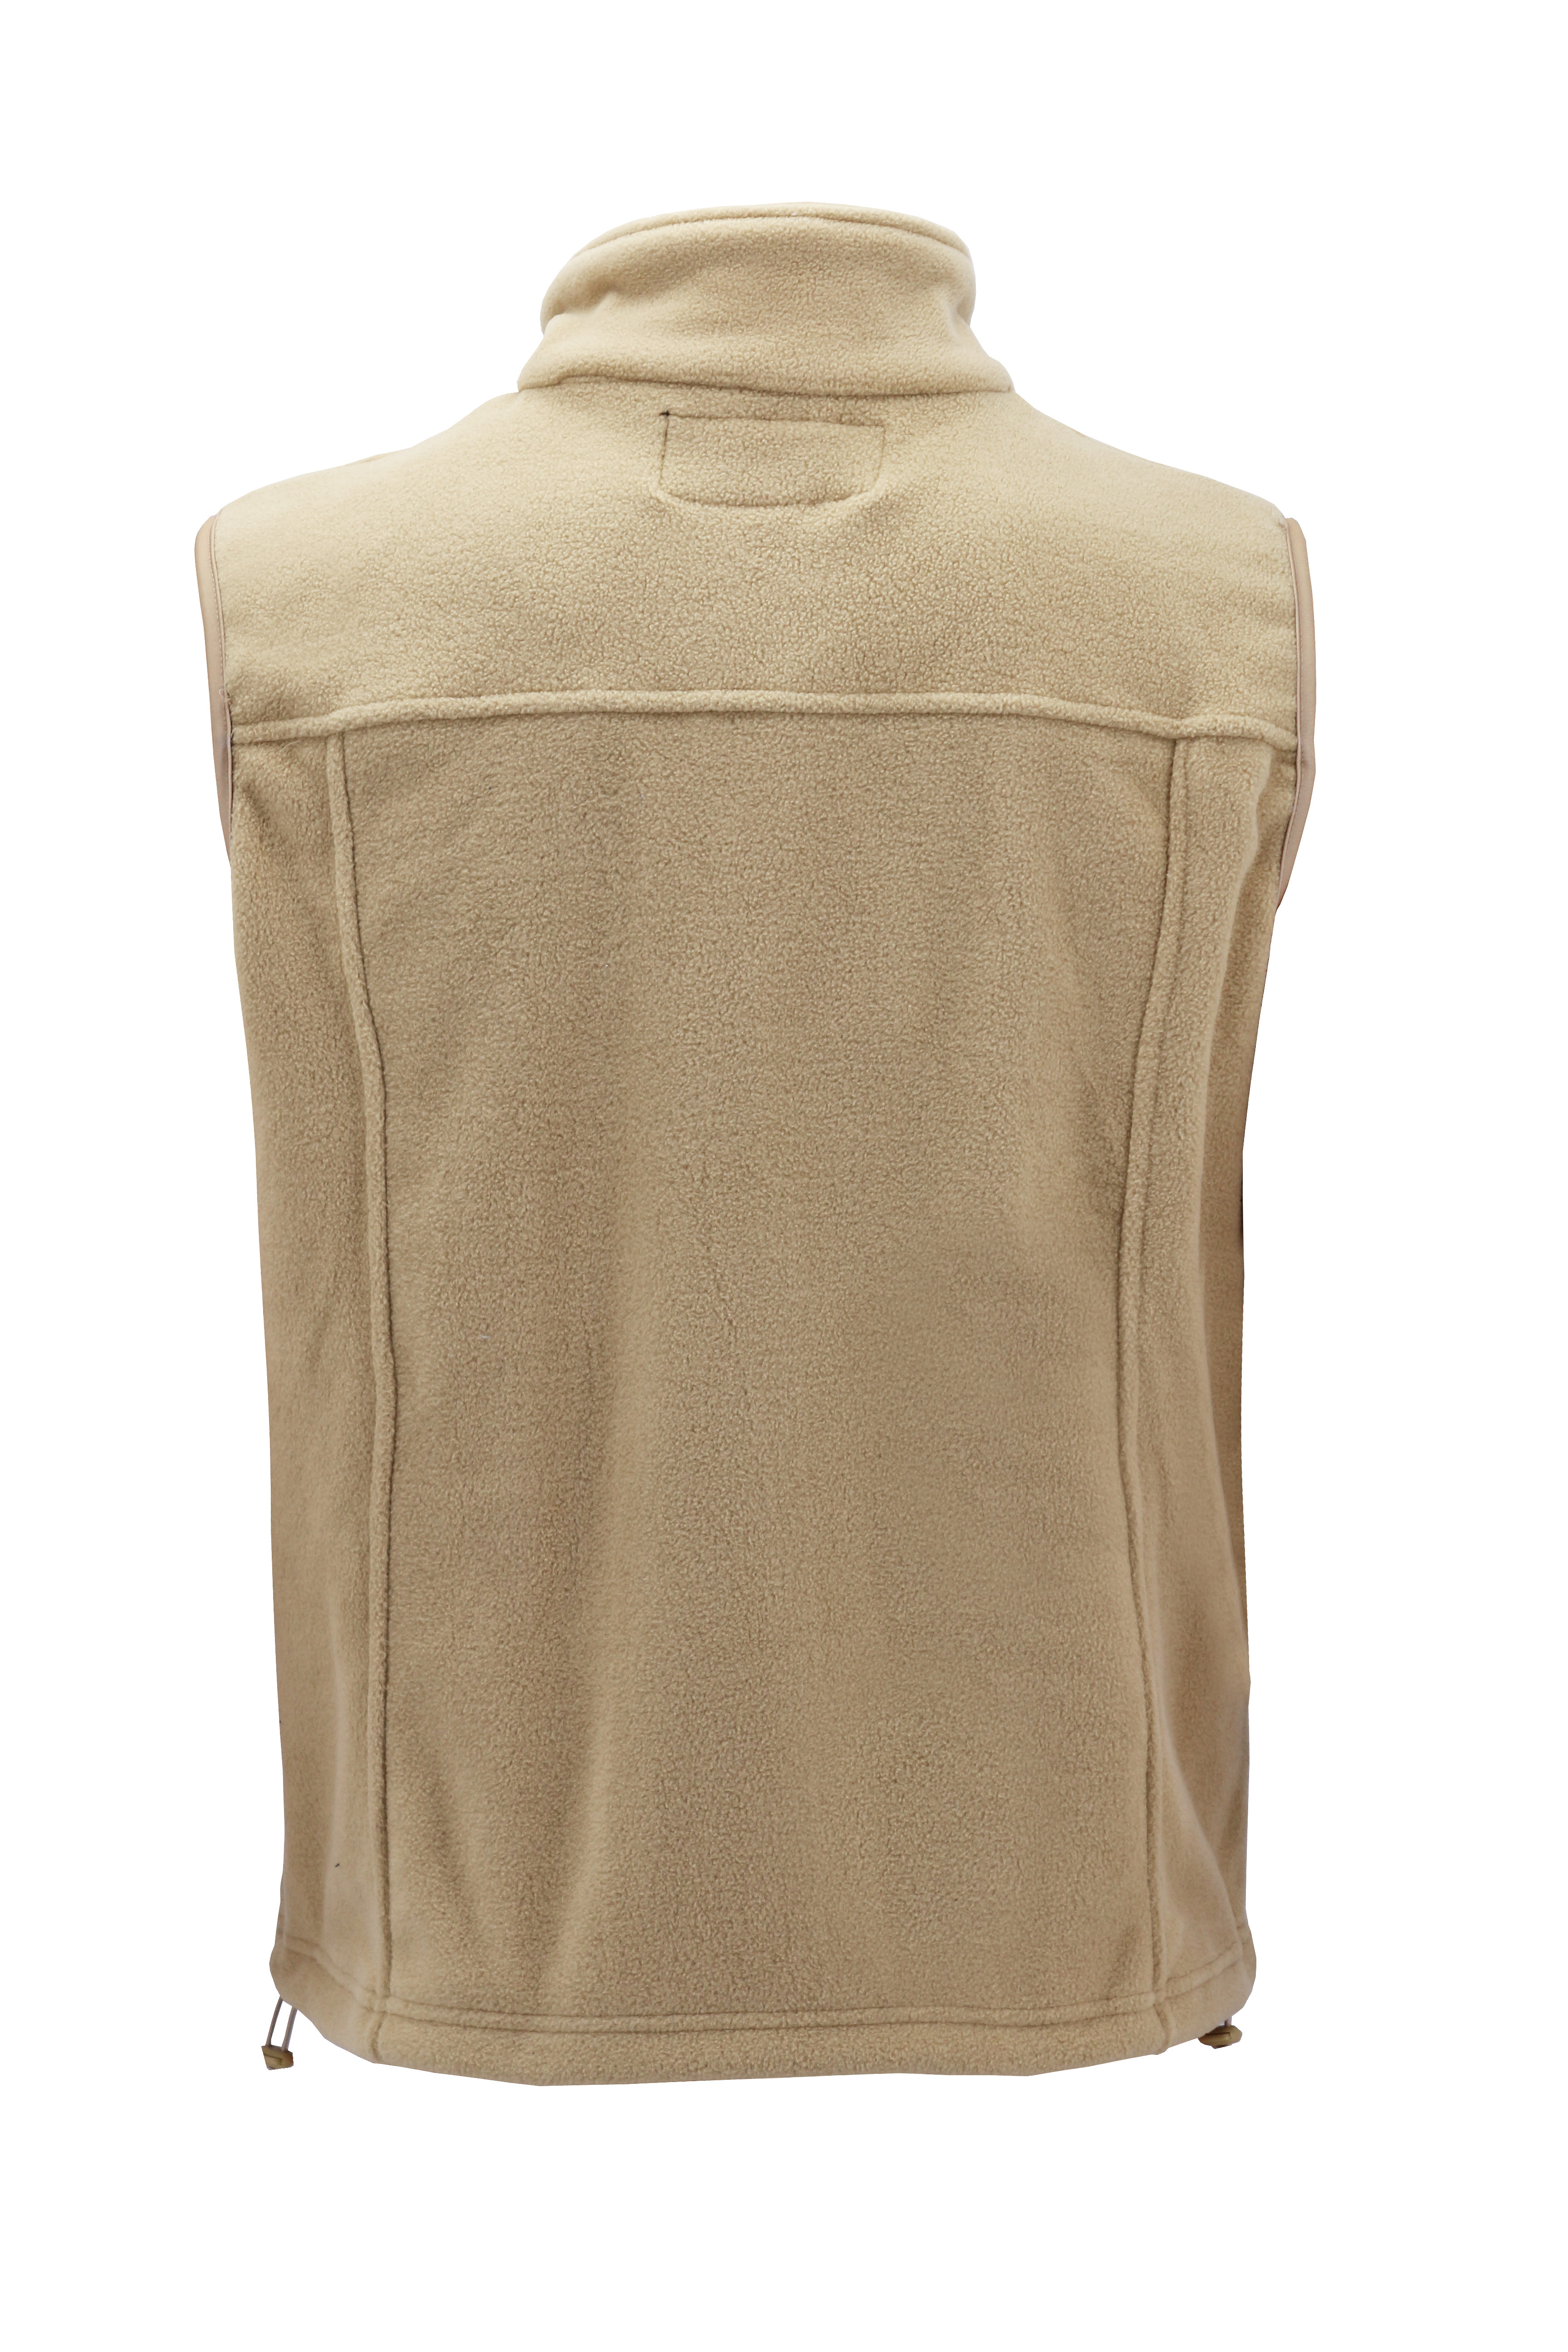 miniature 12 - Men-039-s-Polar-Fleece-Lightweight-Warm-Jacket-Collared-Full-Zip-Up-Sweater-Vest